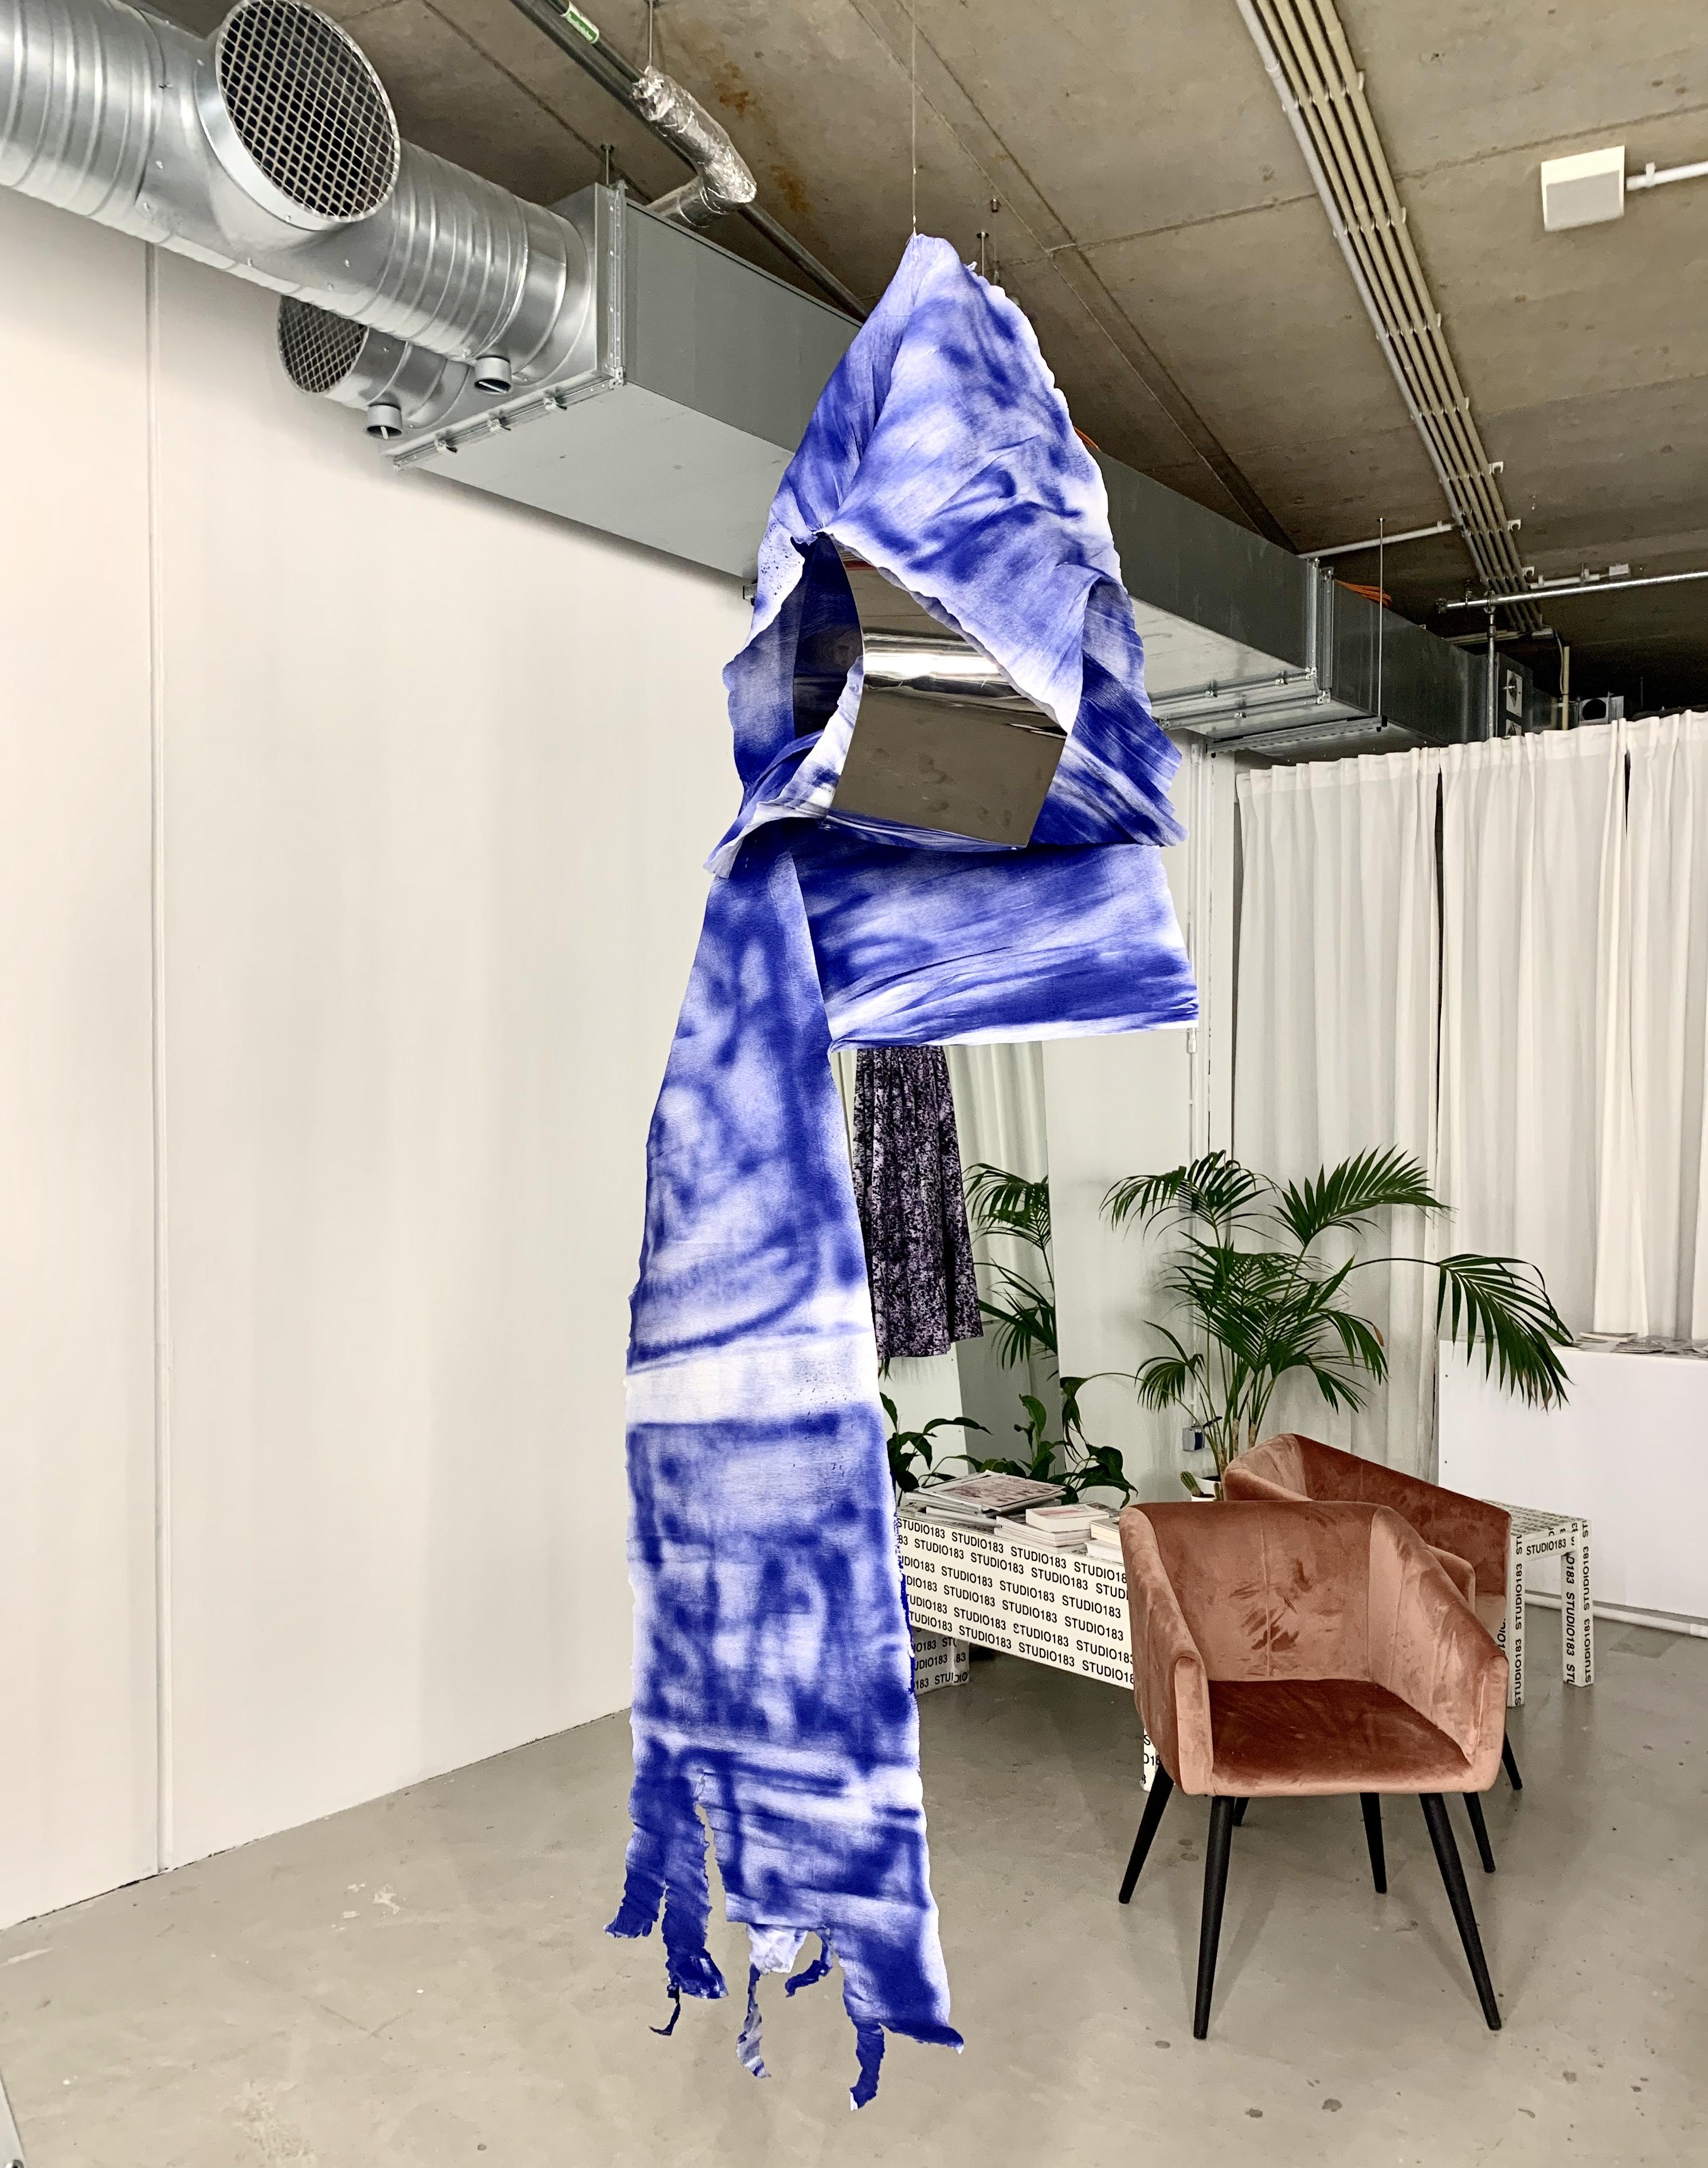 Exhibition at BIKINI Berlin